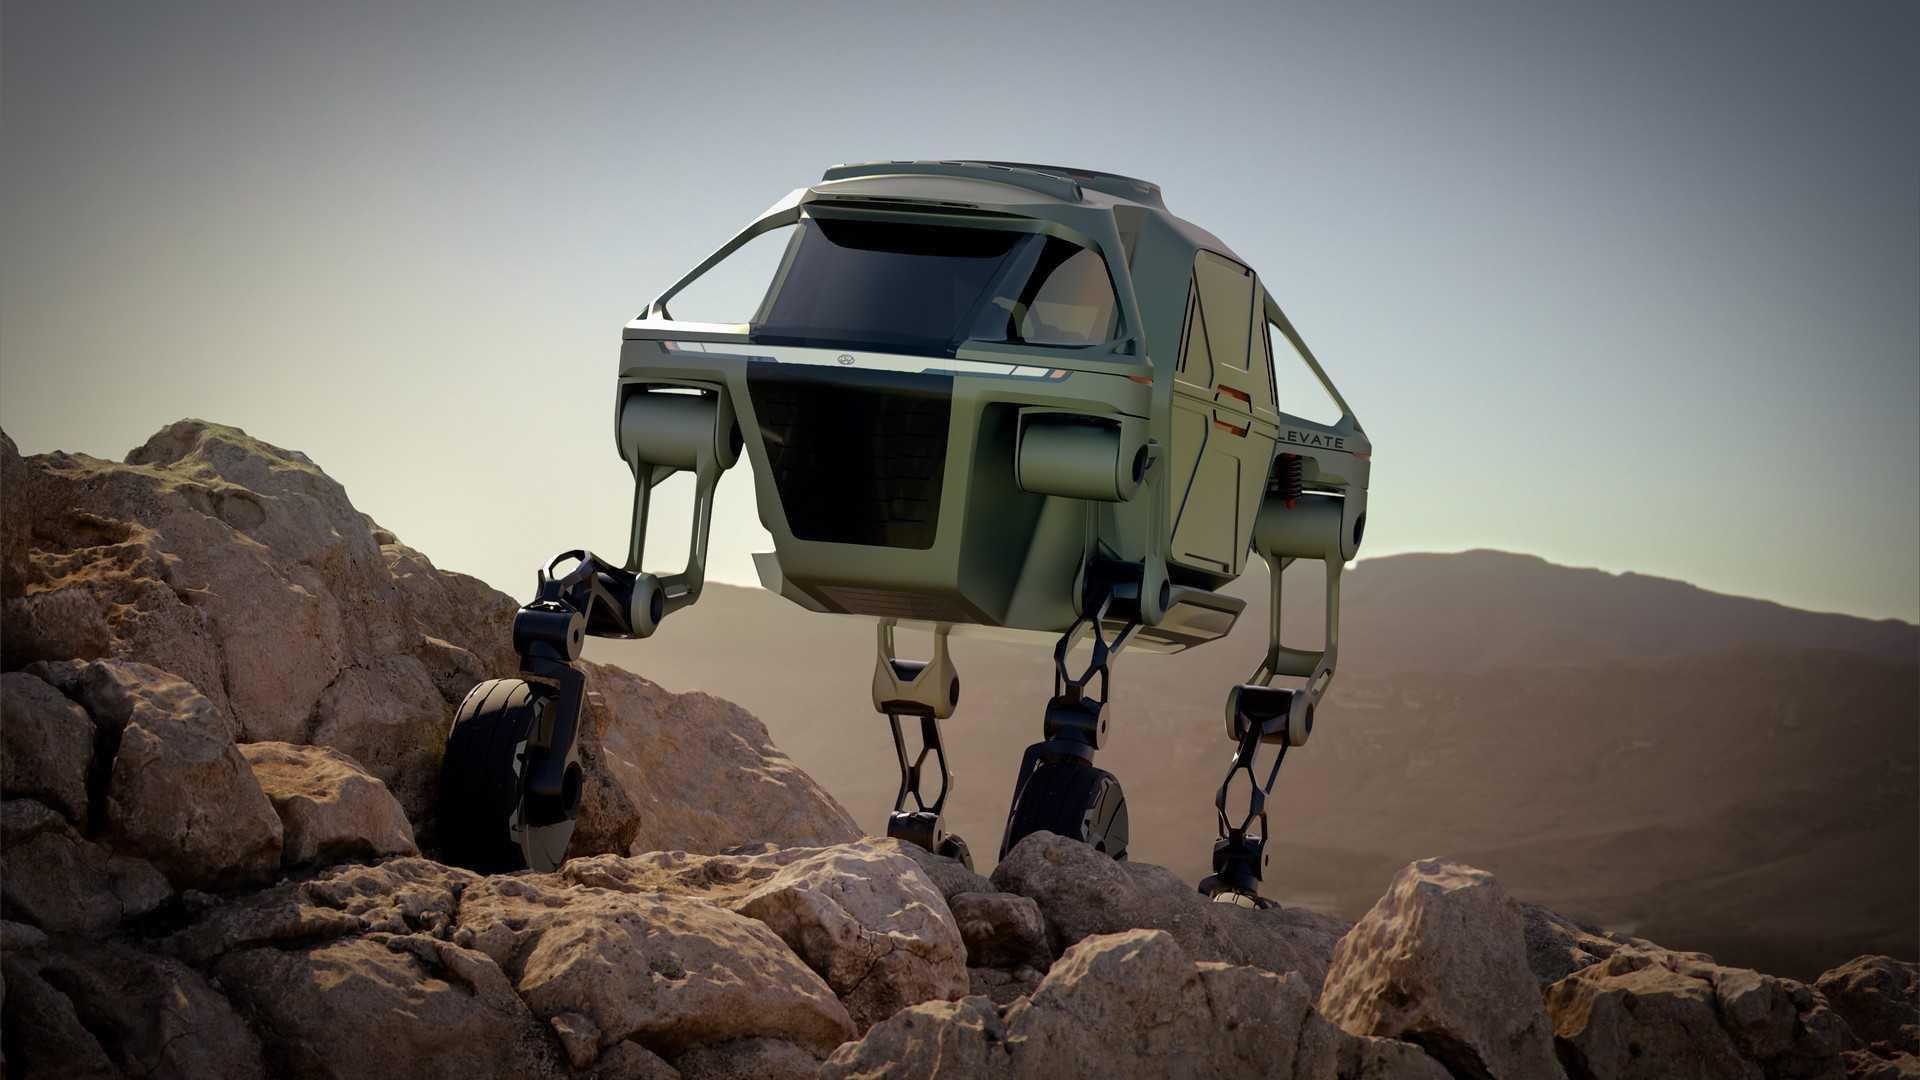 《CES专题》最难看的奇形怪状汽车